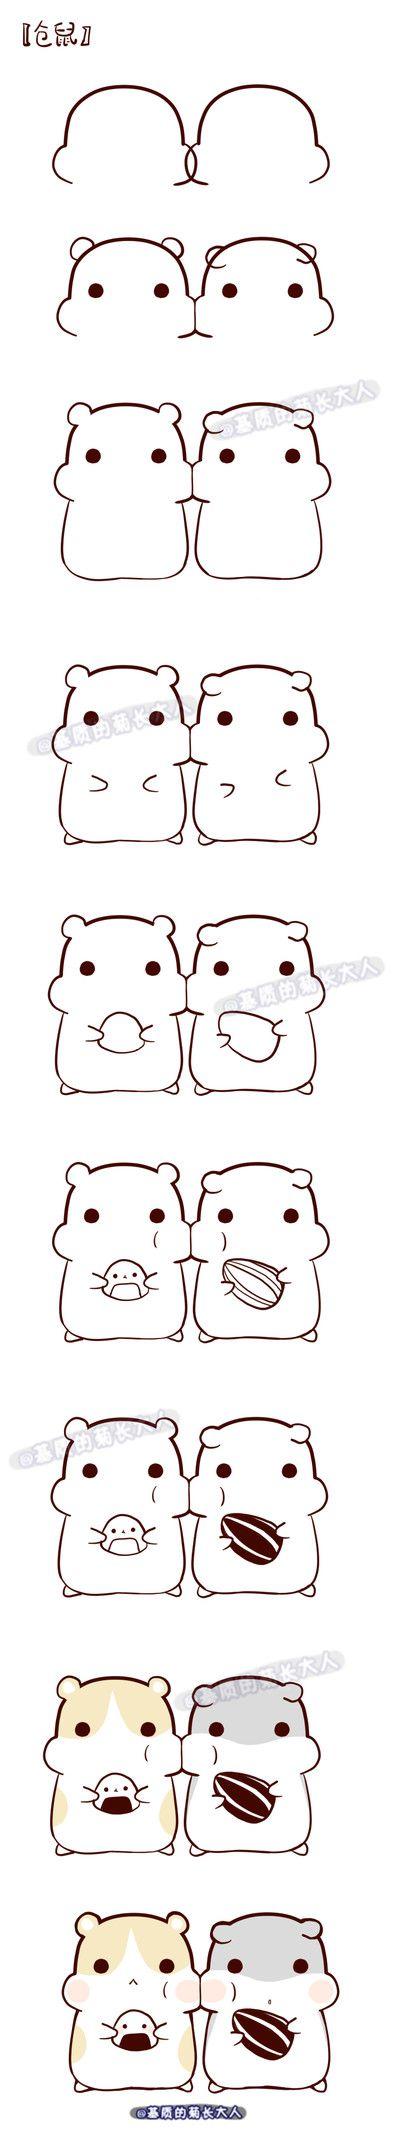 Little Cute Animals Manga Style Art Pinterest Drawings Cute